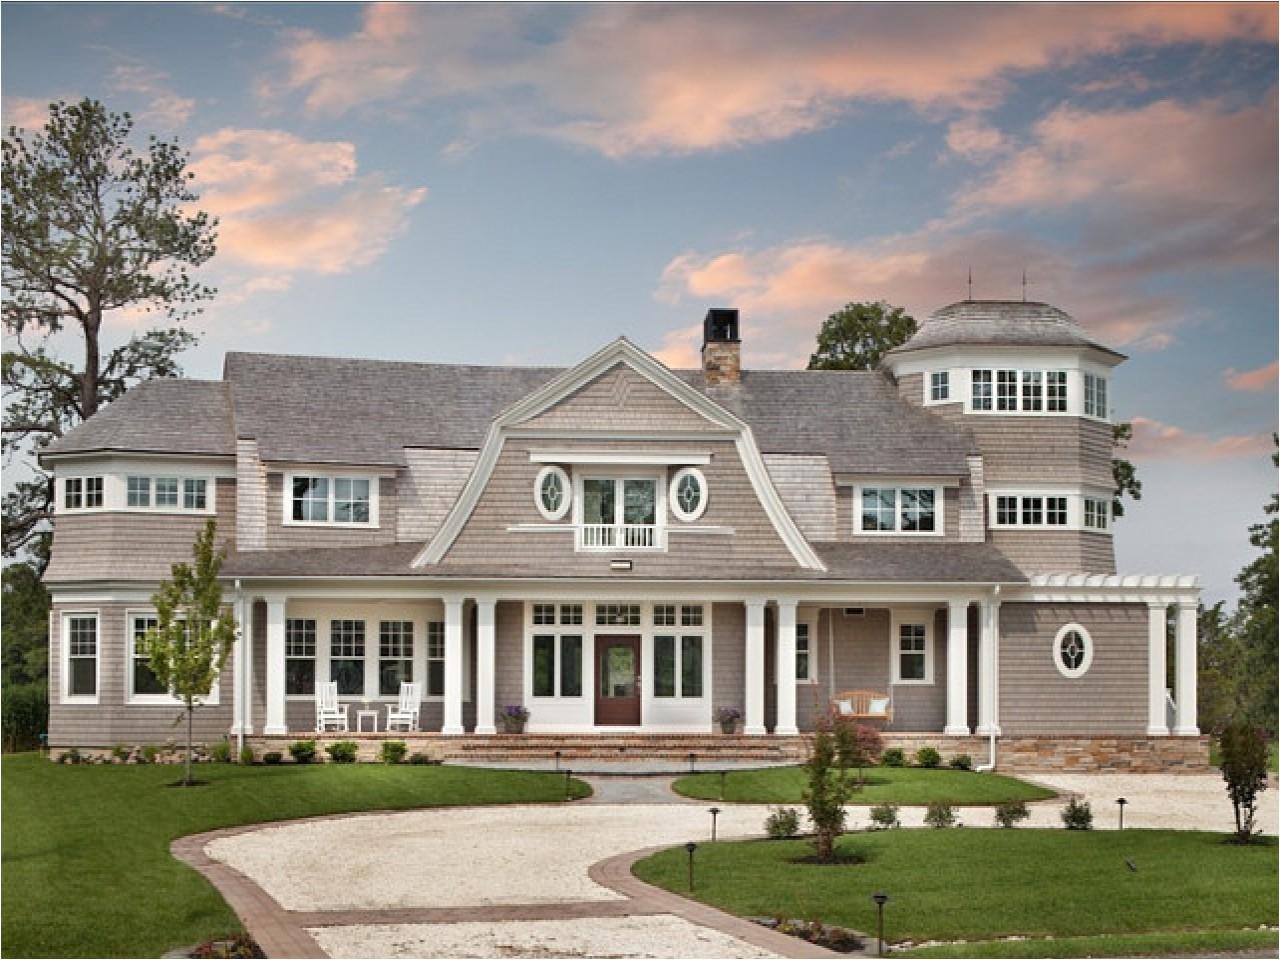 d3cdfe92c8353037 shingle style beach house interior shingle style house black shutters